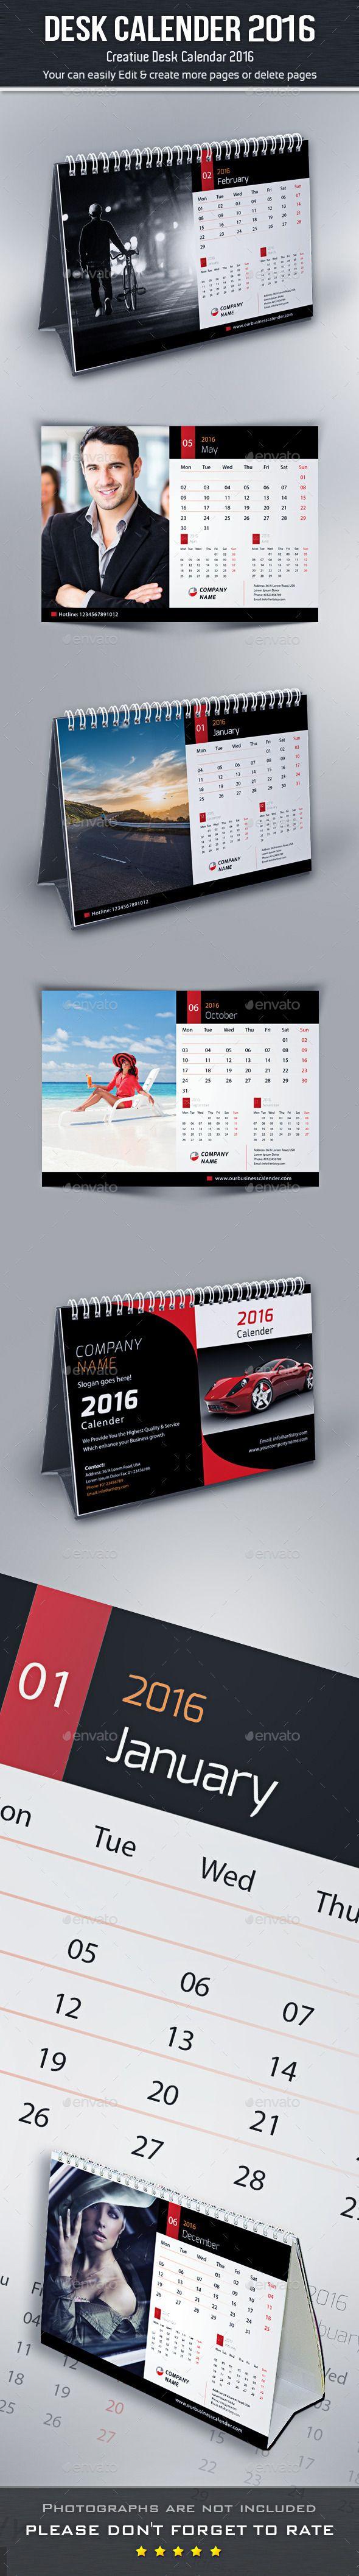 Desk Calendar 2016 Template #design Download: http://graphicriver.net/item/desk-calendar-2016-/12677515?ref=ksioks